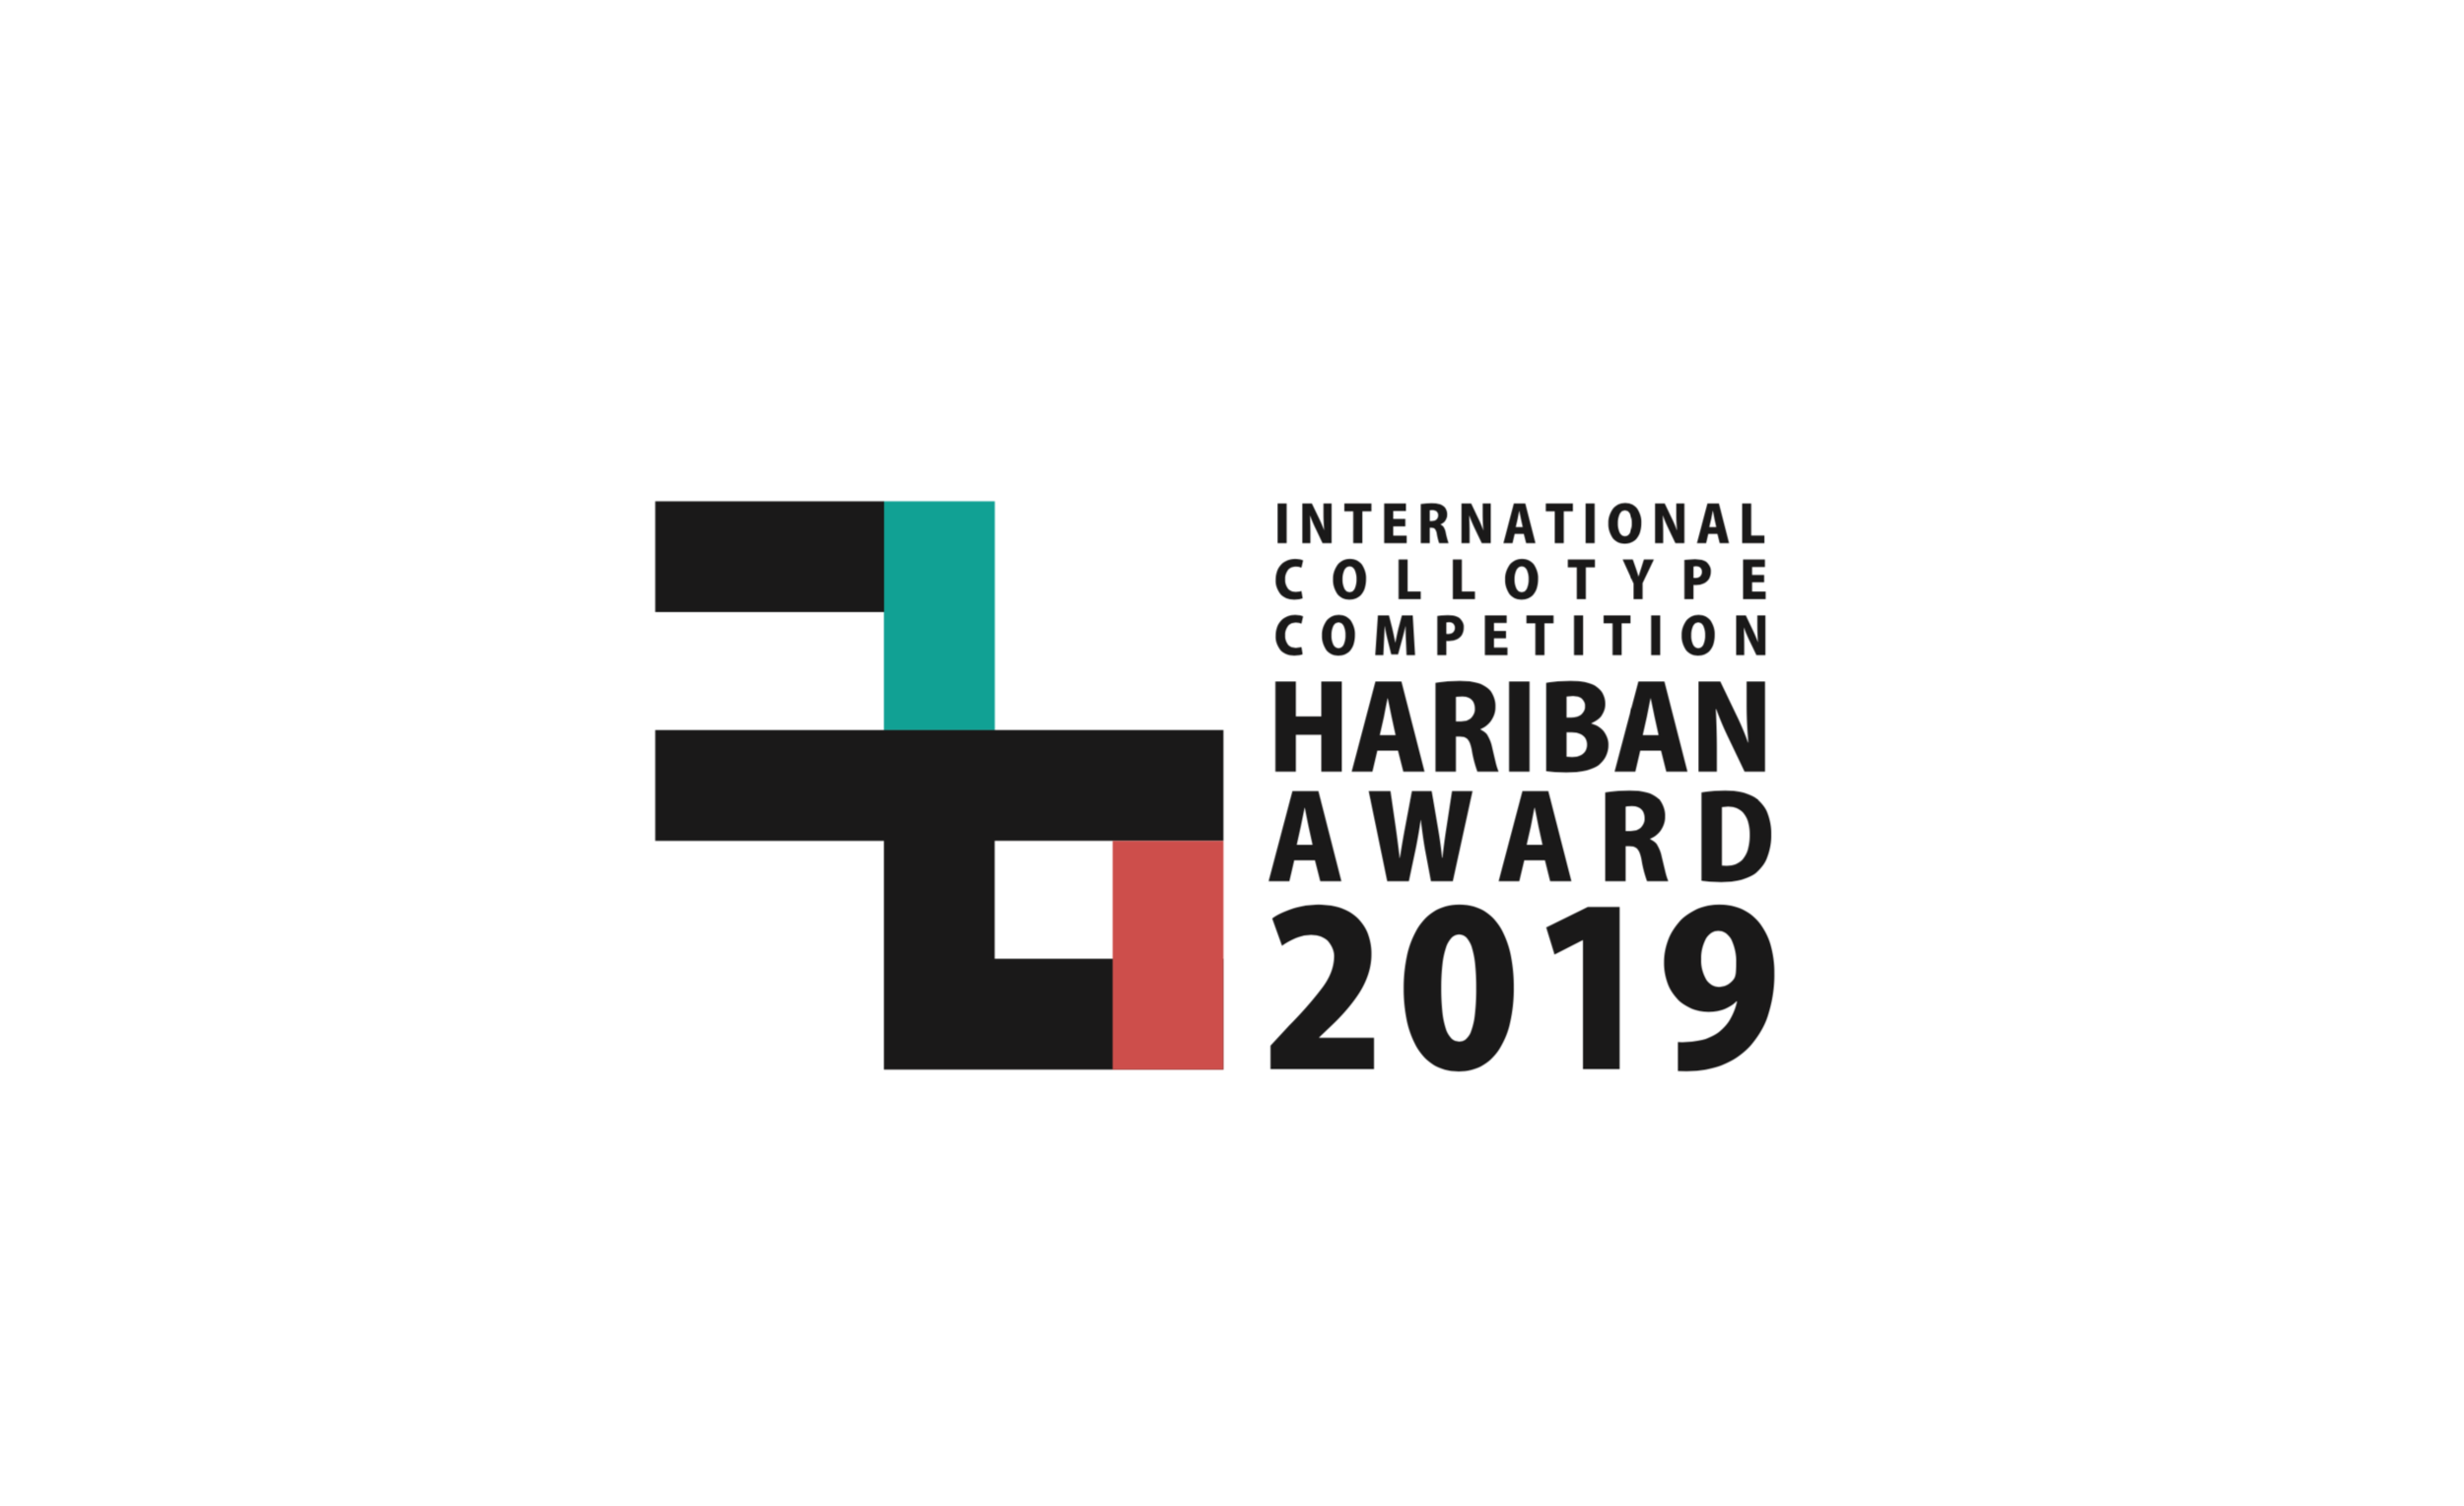 《Hariban Award》 2019 - 截止日期:6月30日,日本時間11:59 pm更多詳情:http://benrido-collotype.today/collotype-competition/